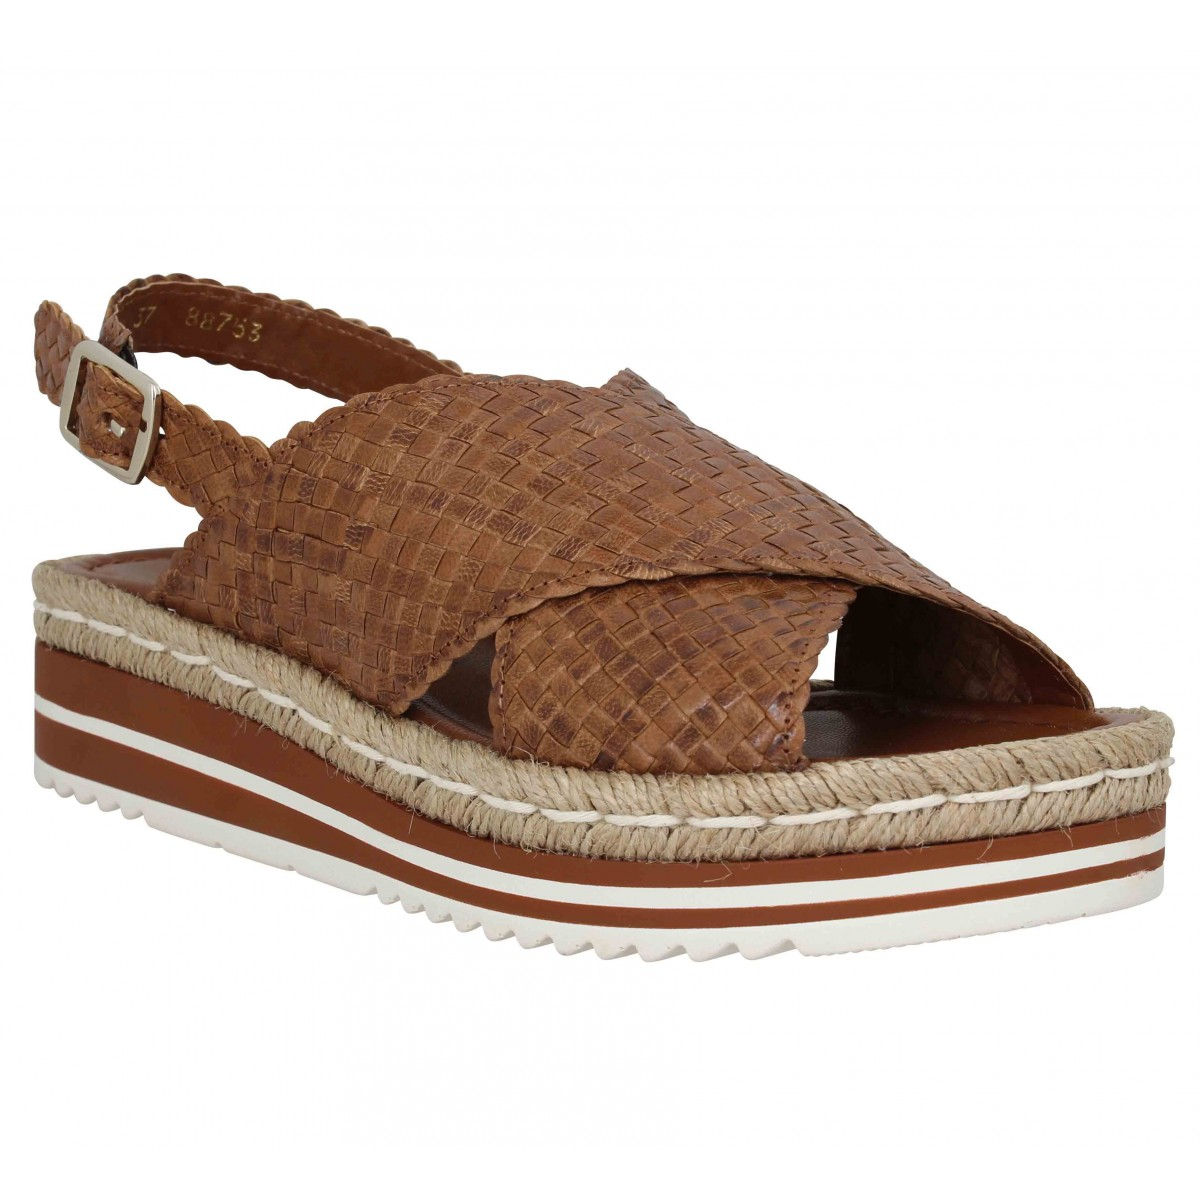 Sandales talons PONS QUINTANA 7665 cuir Femme Marron